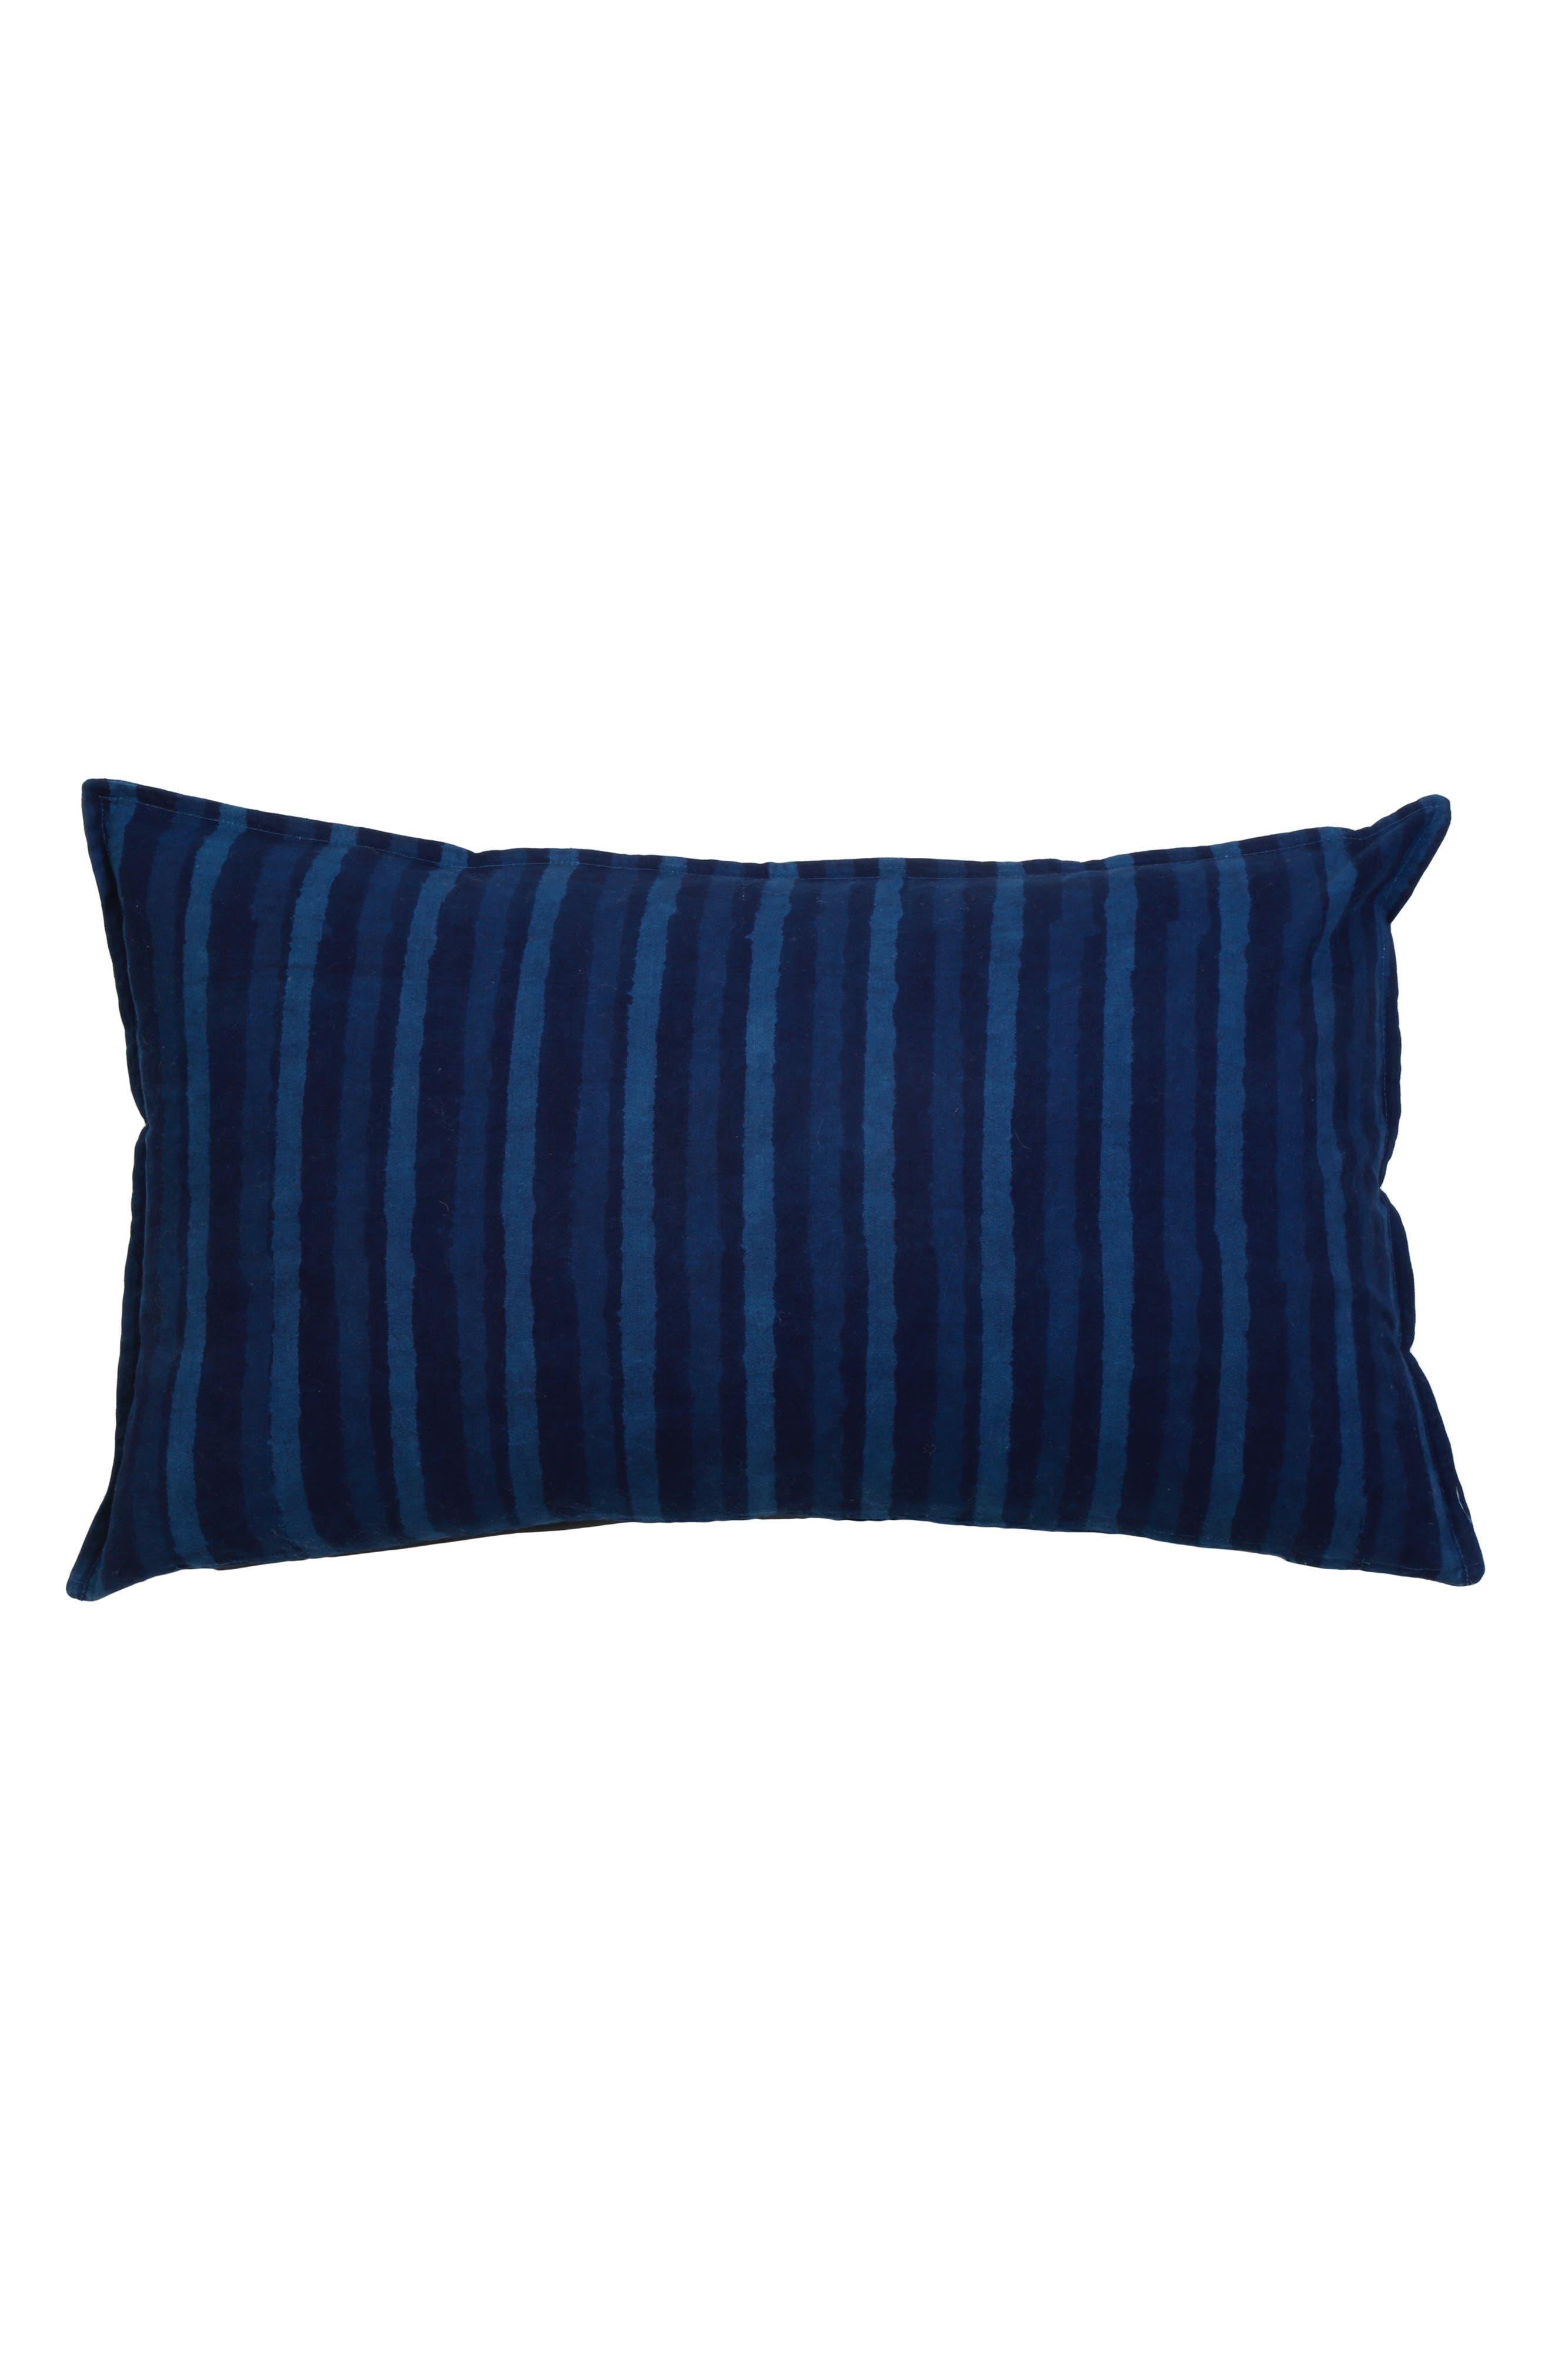 Indigo Stripe Accent Pillow,                             Main thumbnail 1, color,                             Blue Multi